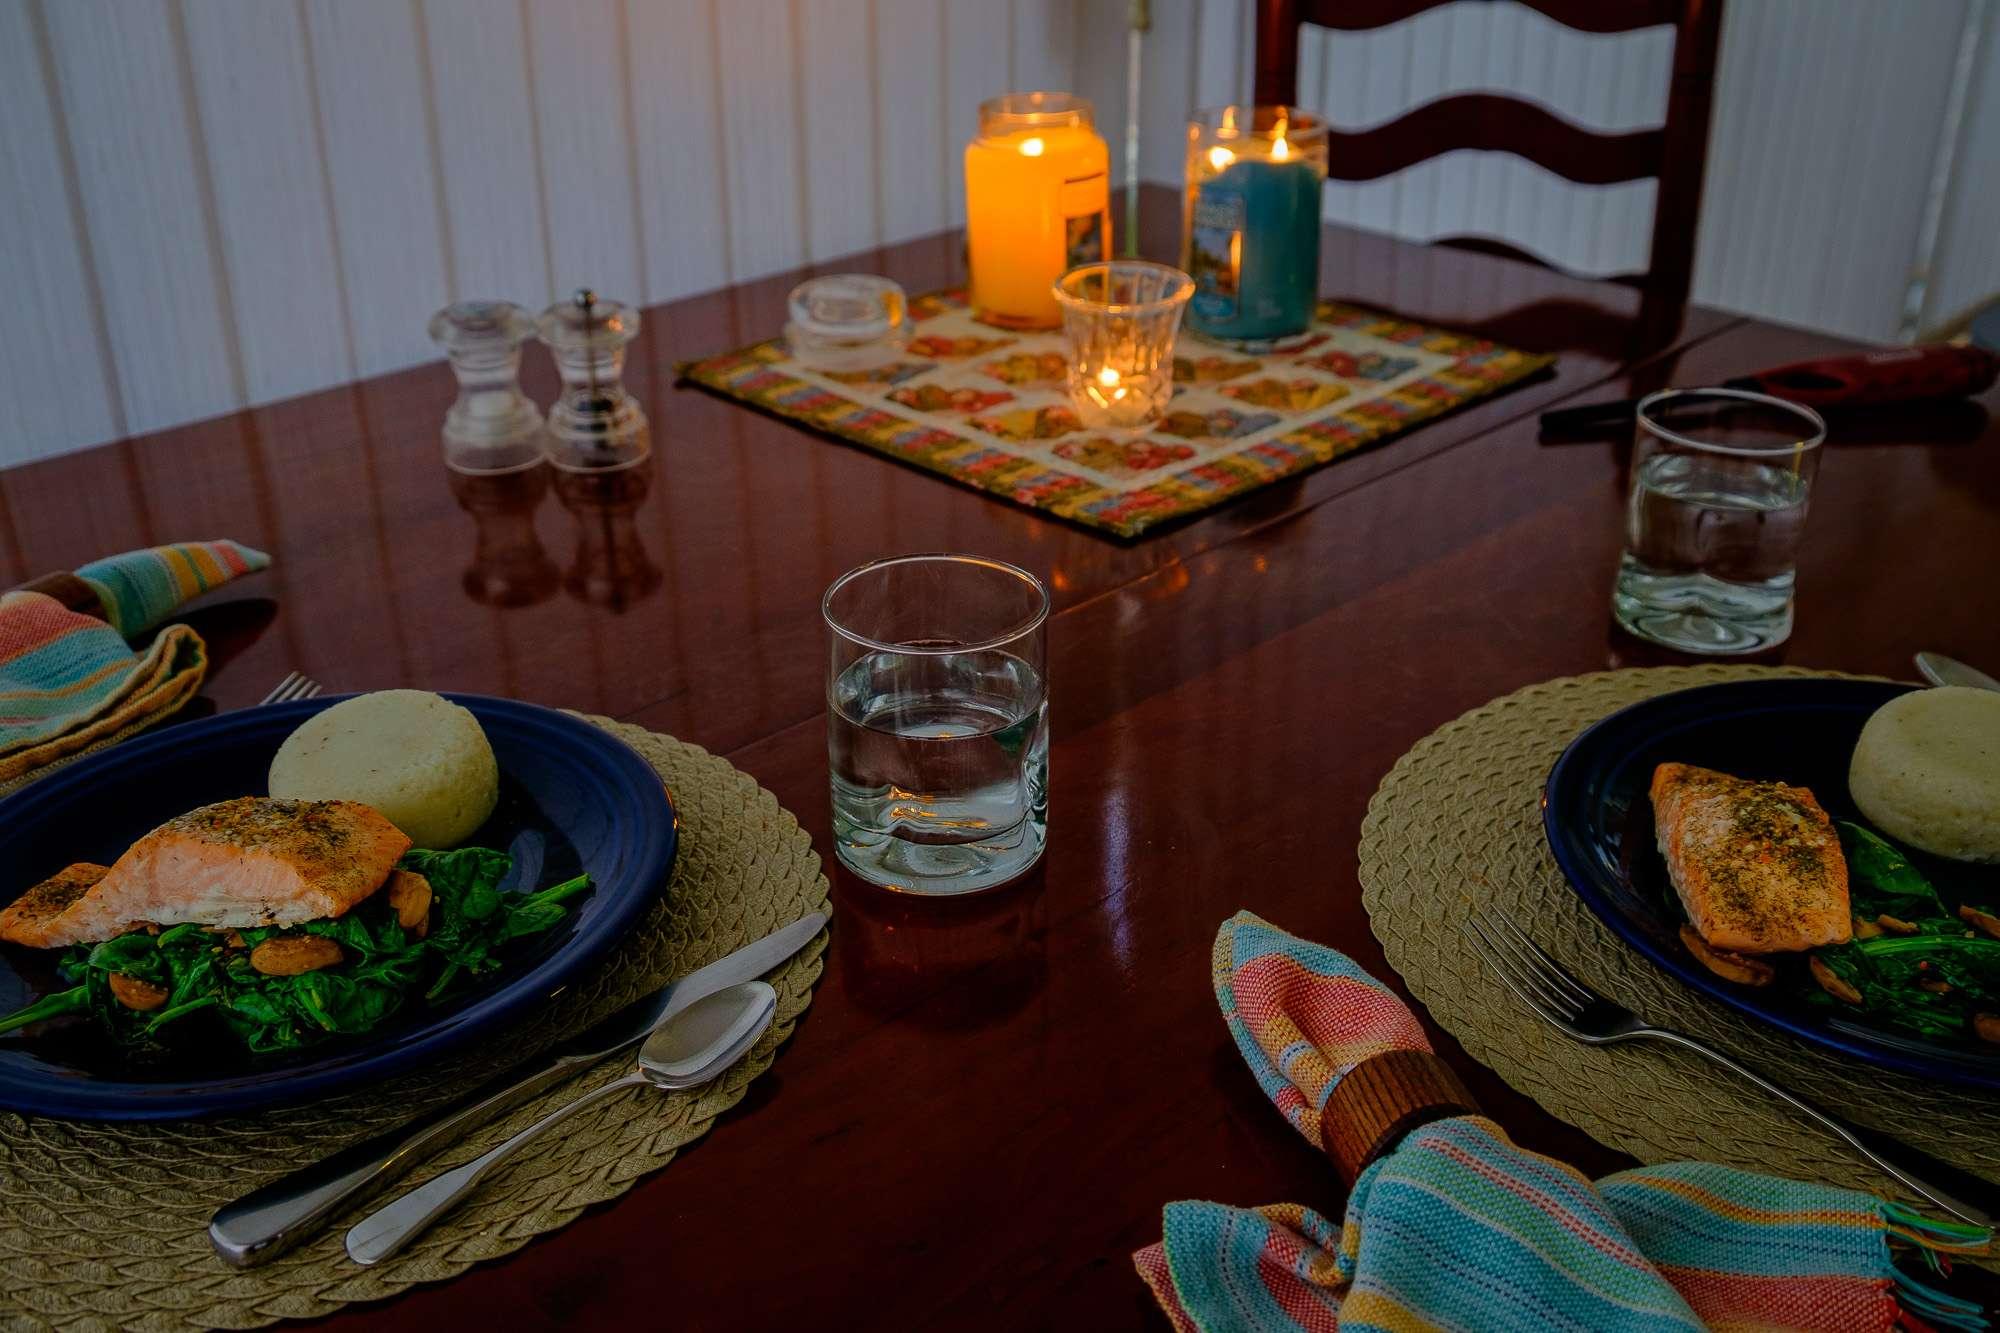 Ed Batsel - Food - Dinner Time